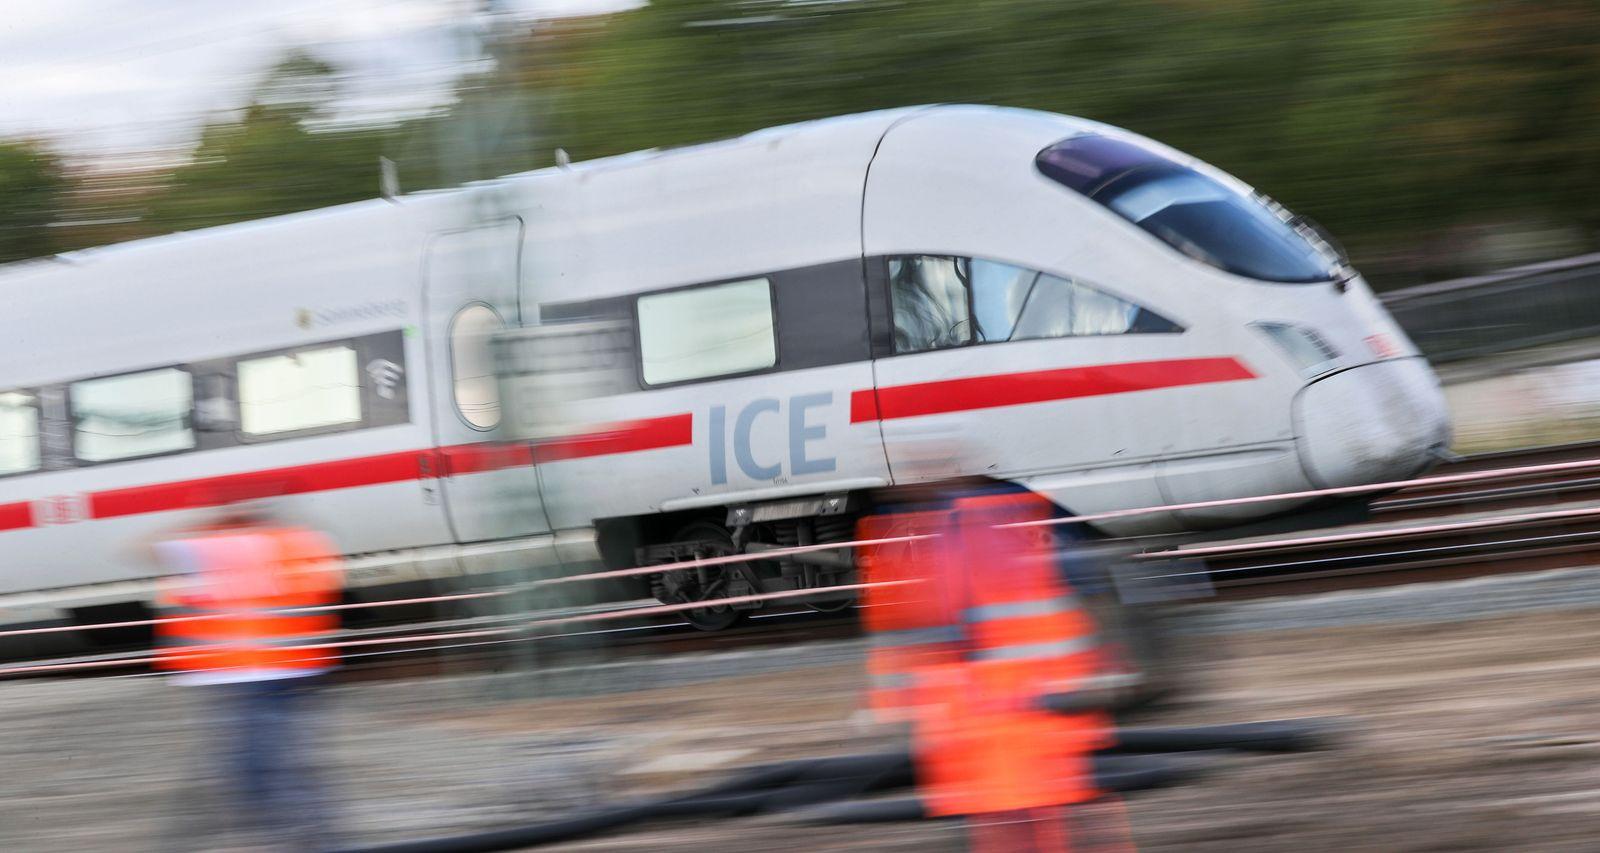 Deutsche Bahn/ ICE